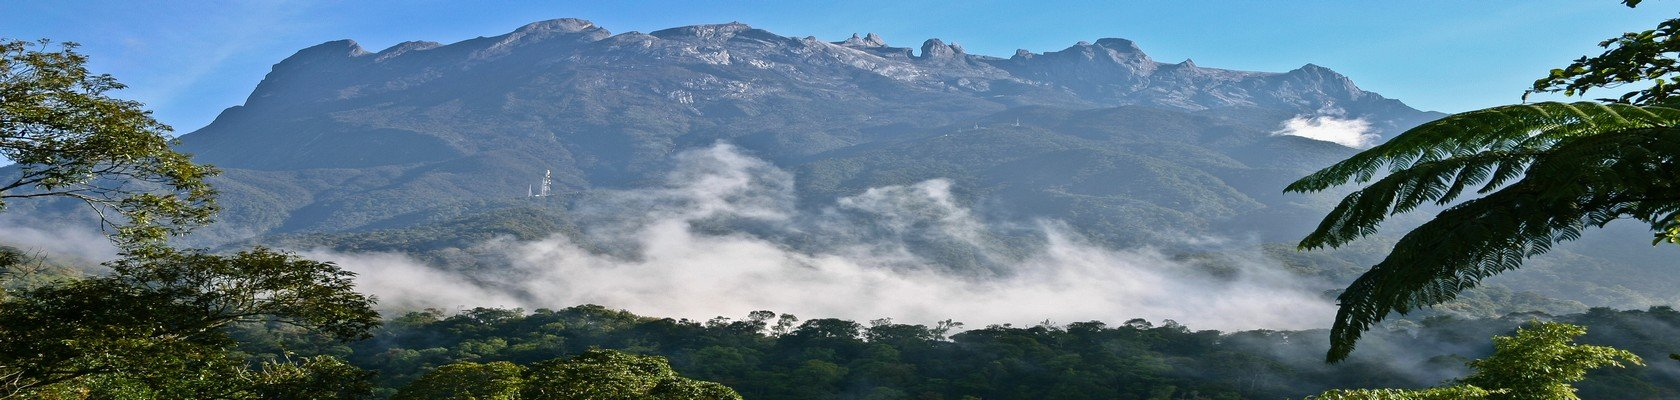 Imposante Kinabalu National Park